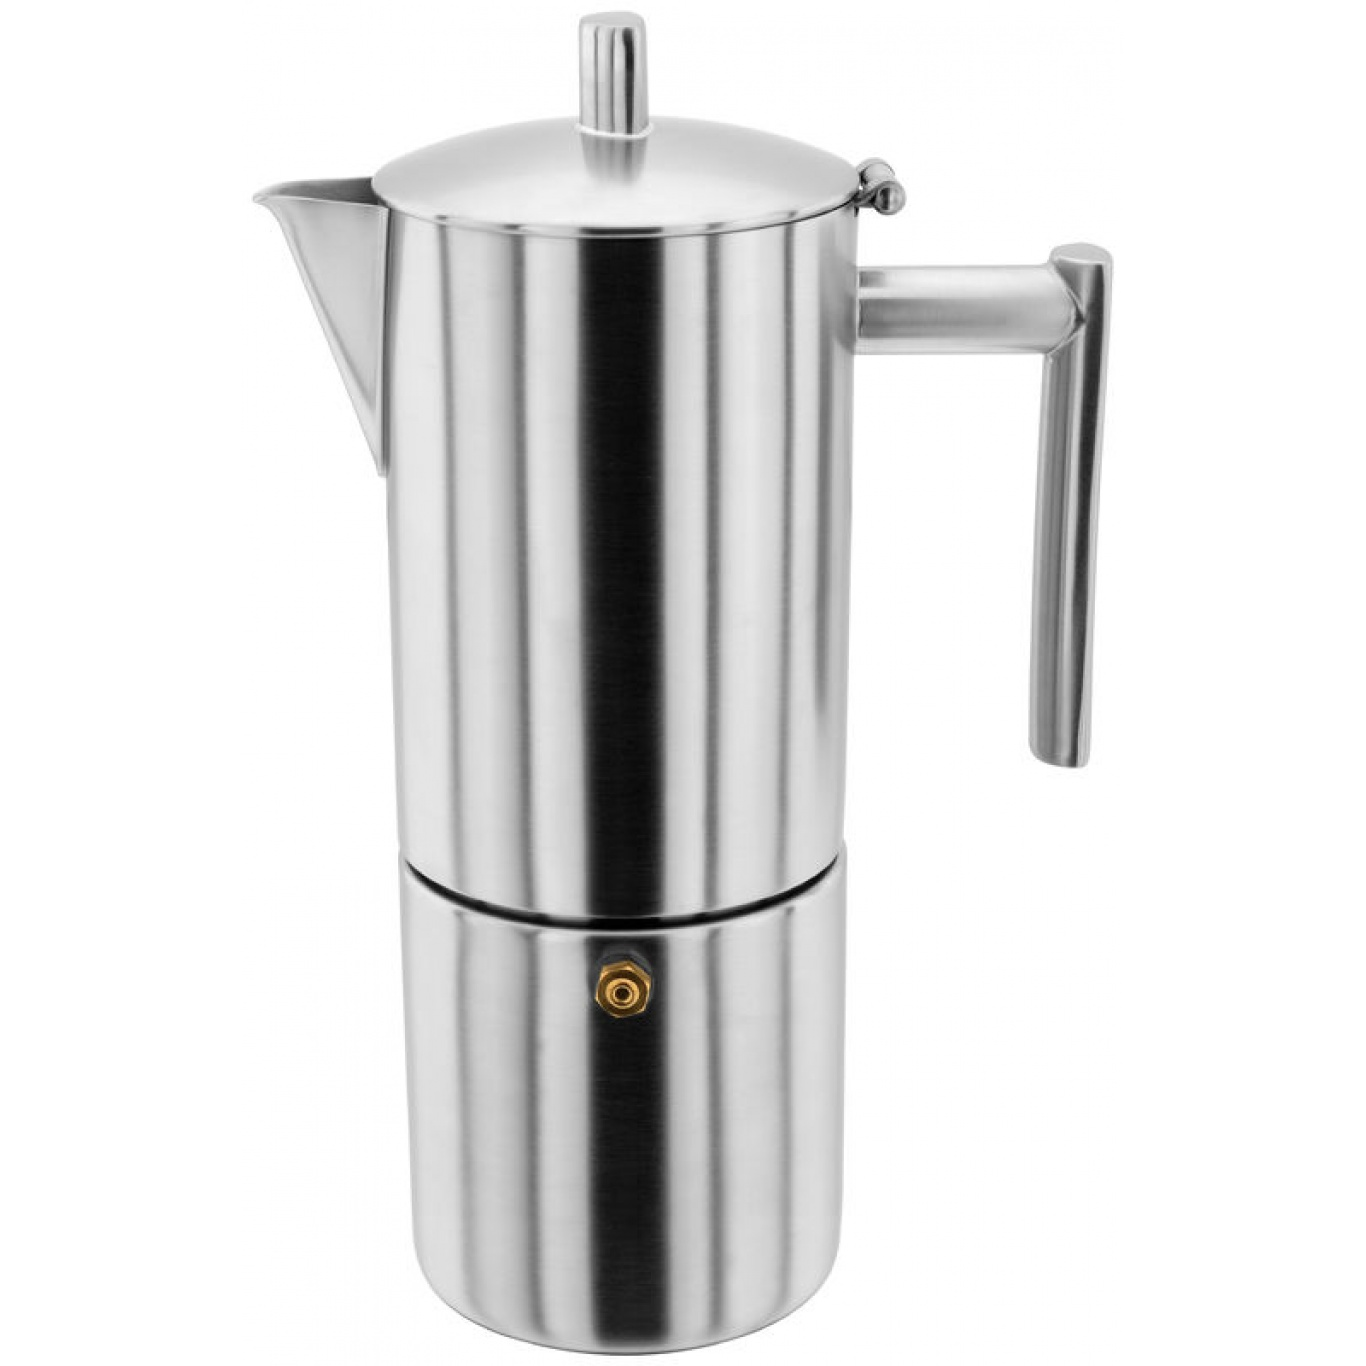 Image of Stellar 6 Cup Espresso Maker